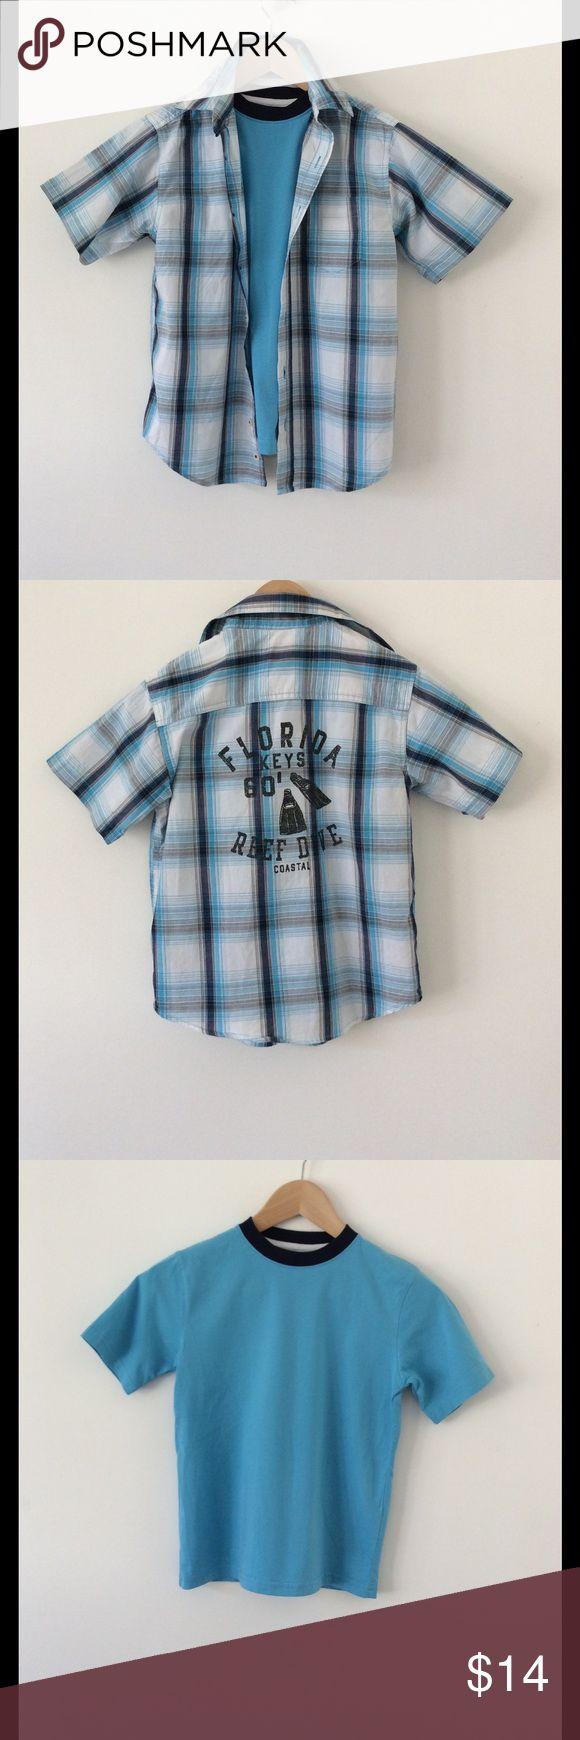 "Boys Layered Shirt Set - Size M (8) Nice layered look! Back of plaid shirt reads:  Florida Keys 80' Reef Dive Coastal...T Shirt: Length: 20"" (shoulder to hem) Width: 15"" (underarm to underarm) Shirt: Length: 21"" (shoulder to hem) Width: 17"" (underarm to underarm) Both 100% Cotton Faded Glory Shirts & Tops Button Down Shirts"